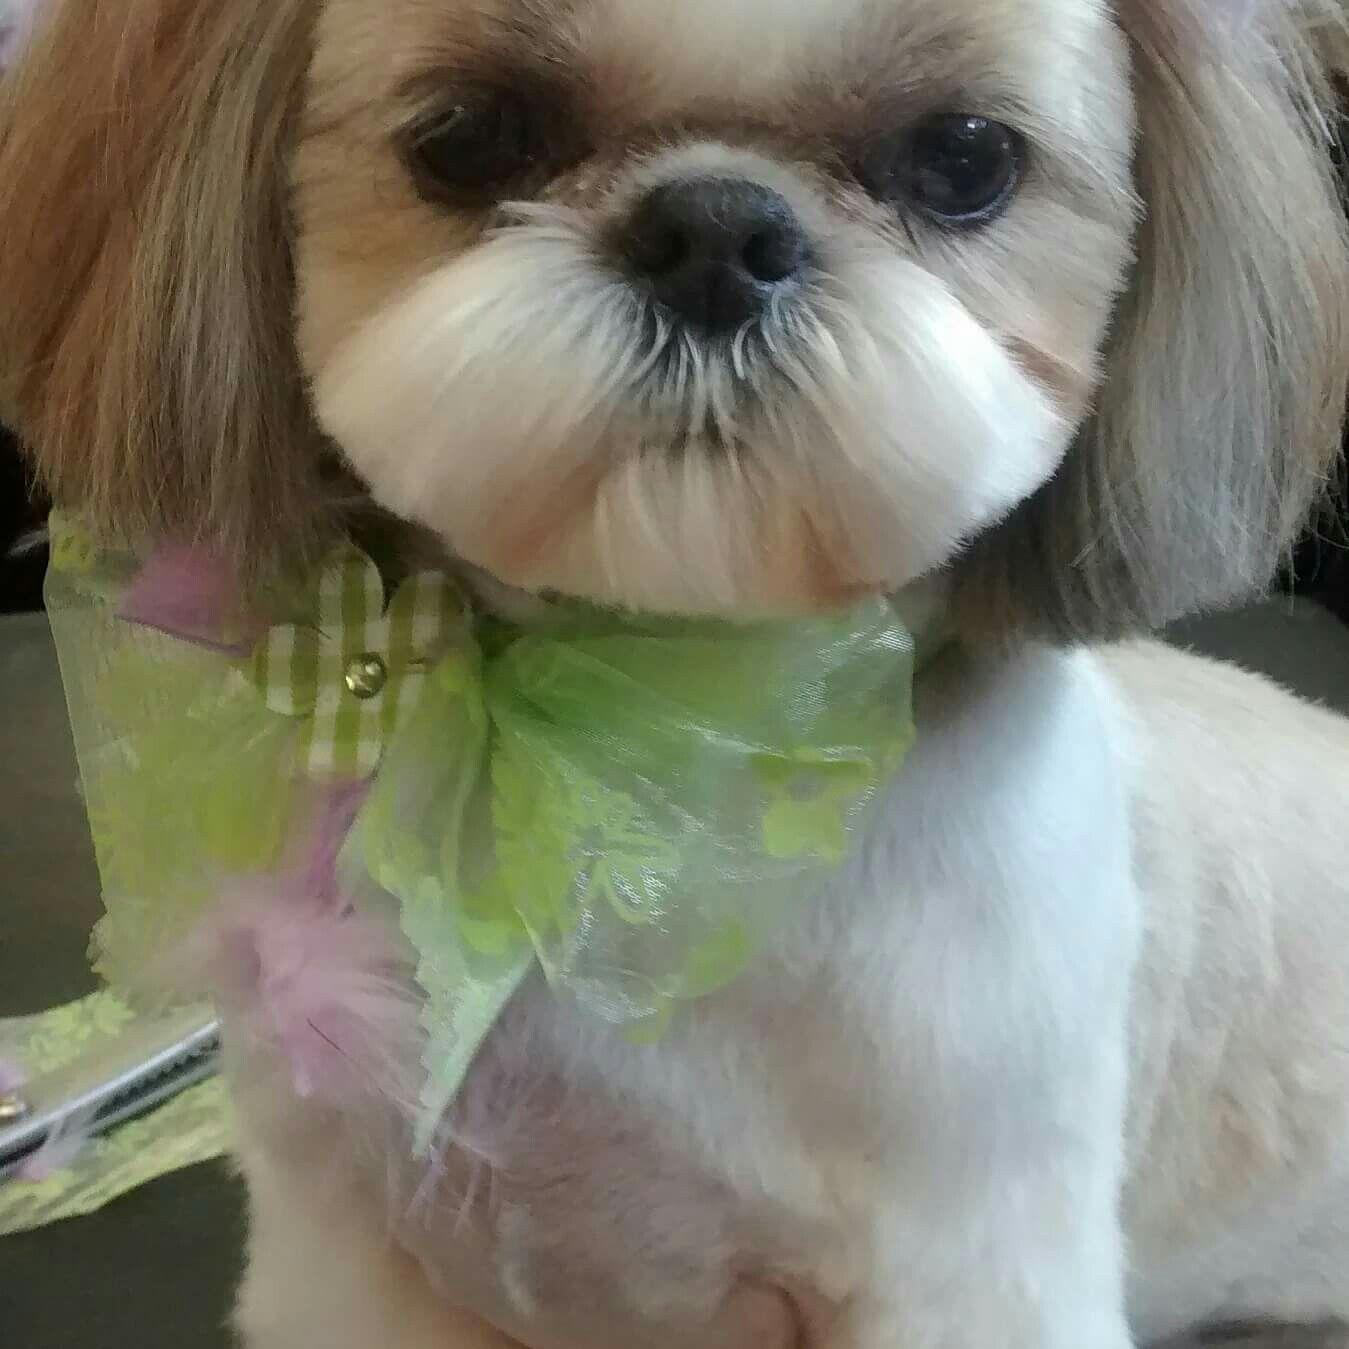 Shih tzu haircut styles pin by corrina scott on jax my fur baby  pinterest